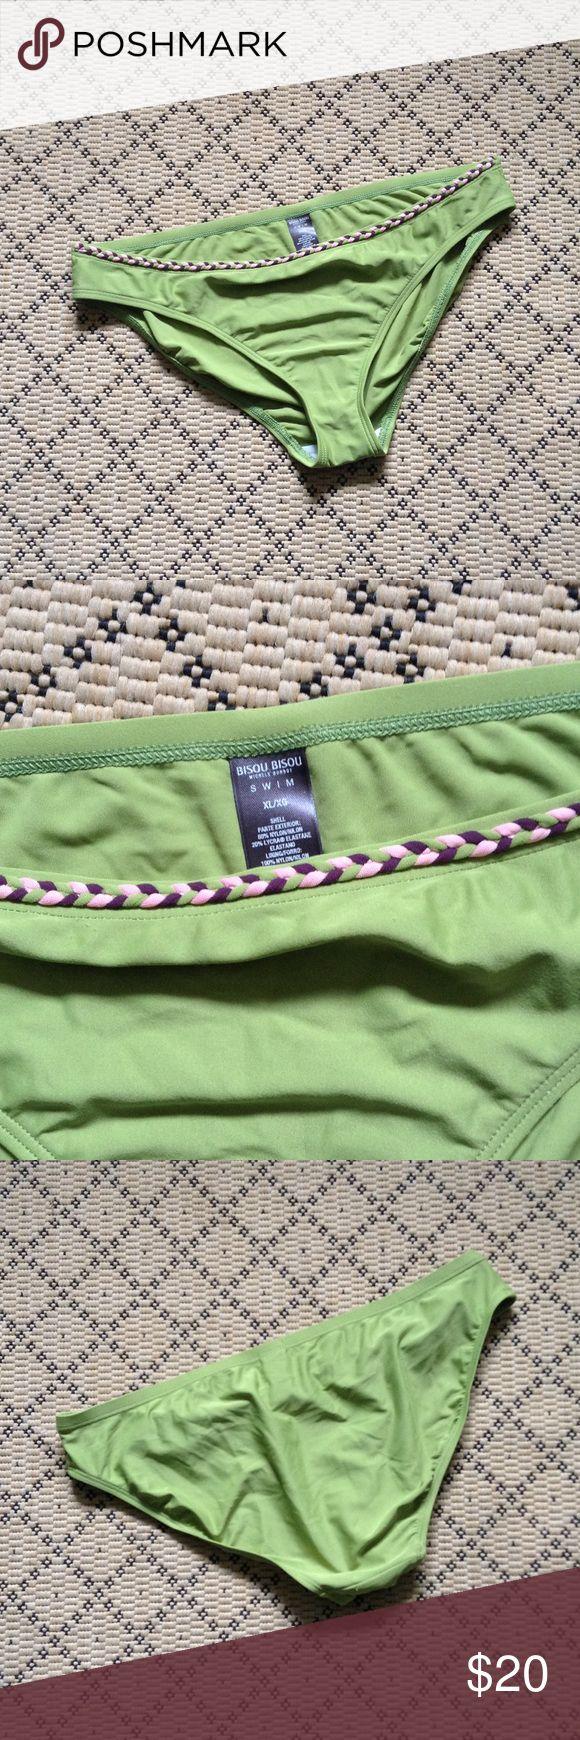 🆕☀️ Apple Green Bikini Bottom 🏖🍏 BRAND NEW! Pretty Apple Green with Pink, Brown, and Green Braided Waist Detail. Full Bottom Coverage. Bisou Bisou Brand Size XL Bisou Bisou Swim